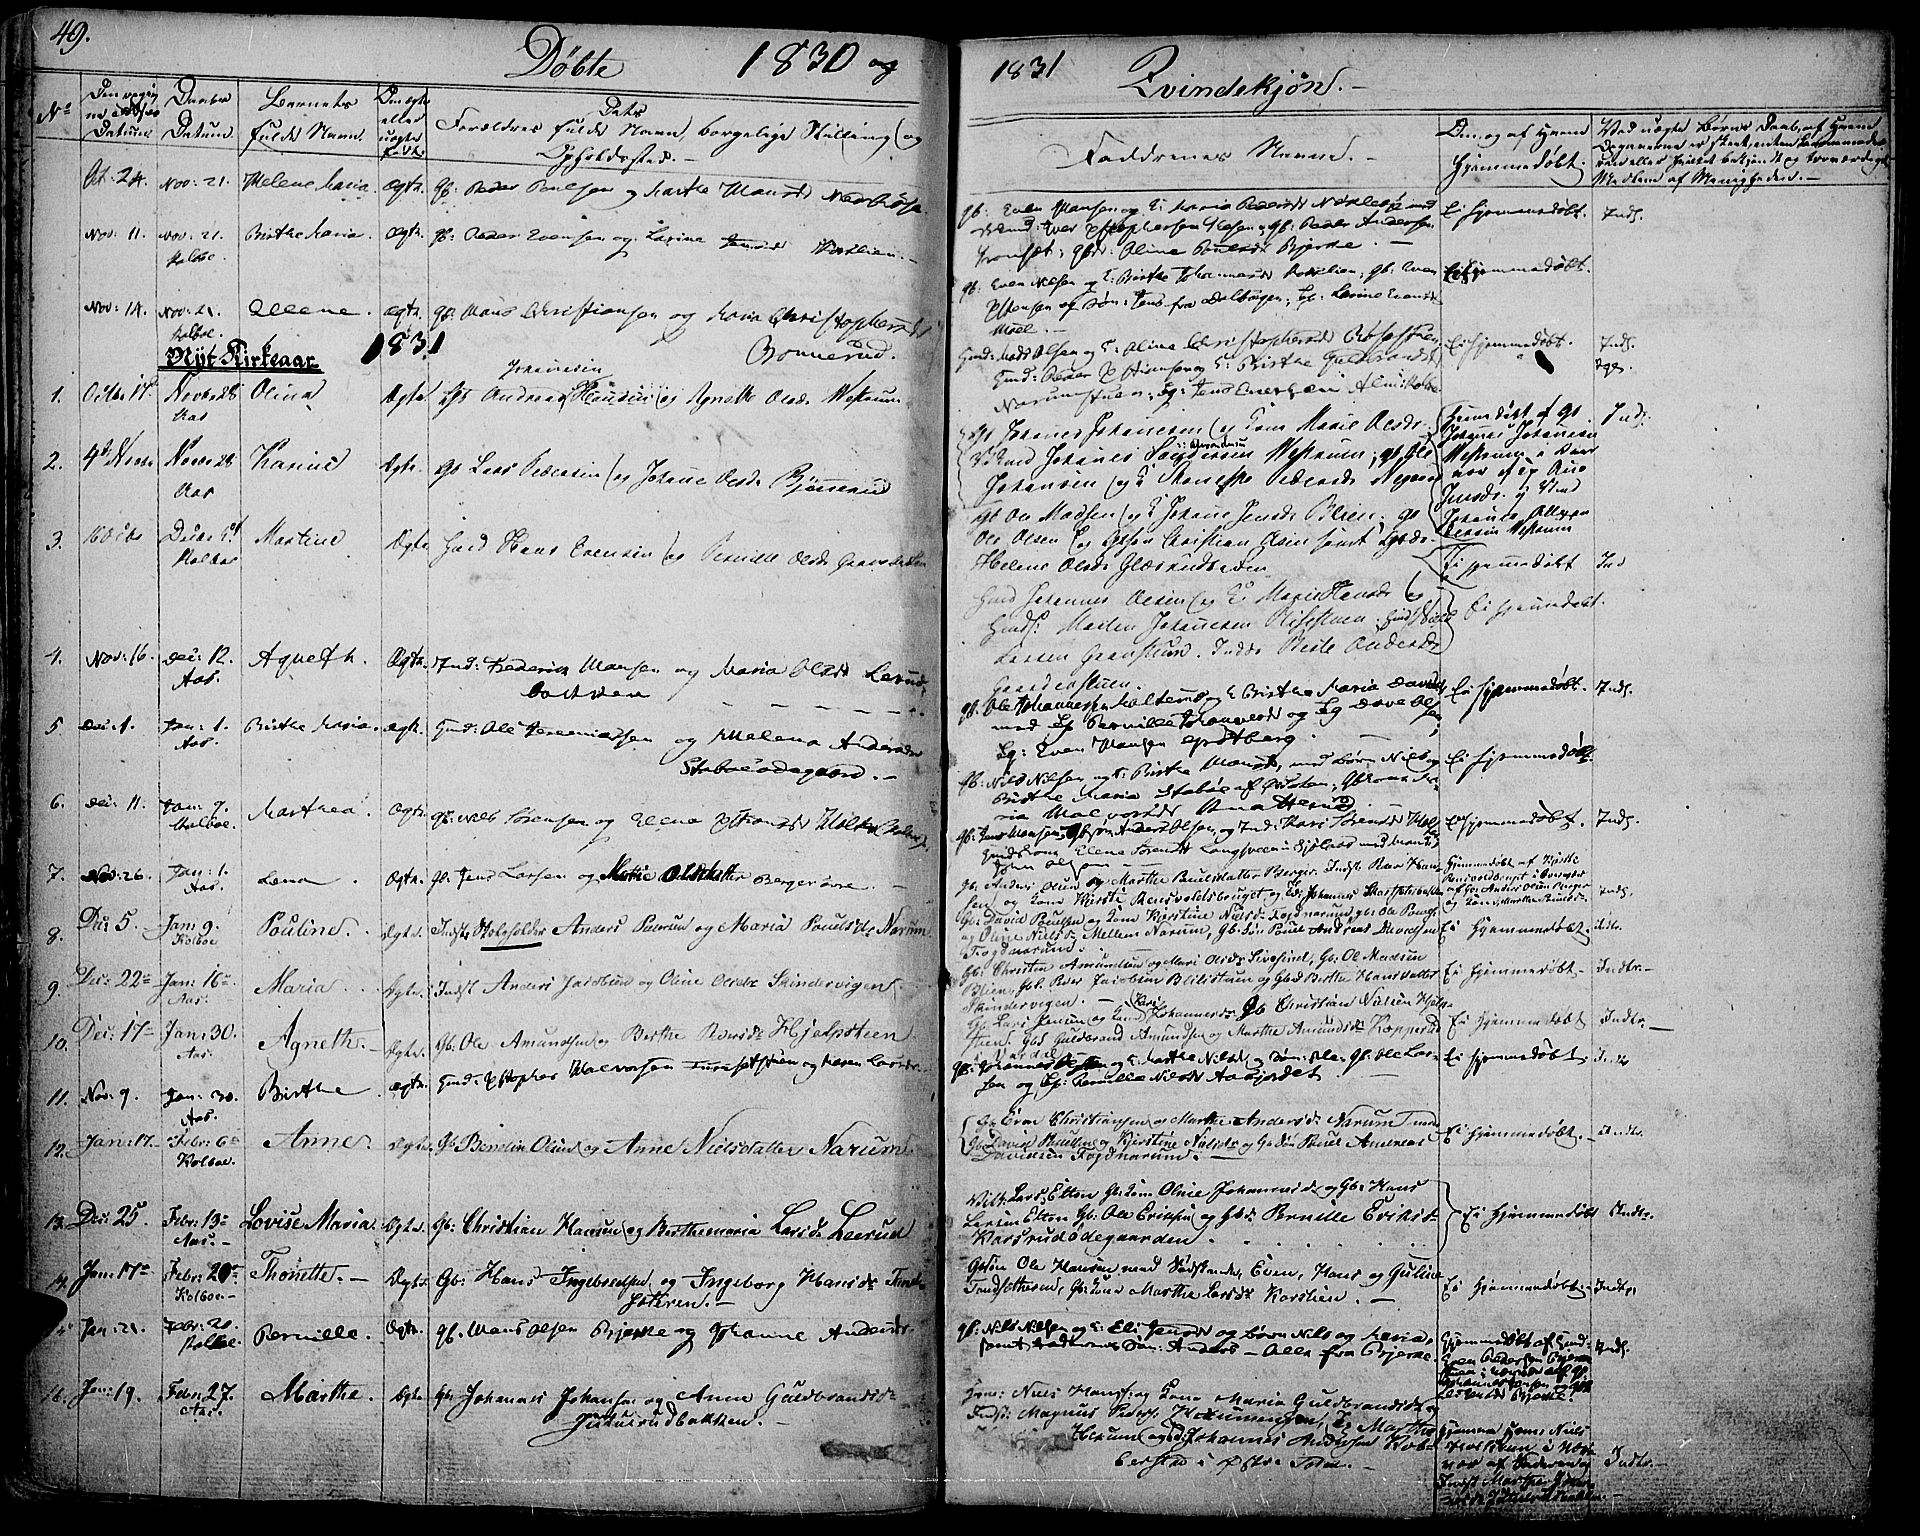 SAH, Vestre Toten prestekontor, H/Ha/Haa/L0002: Ministerialbok nr. 2, 1825-1837, s. 49